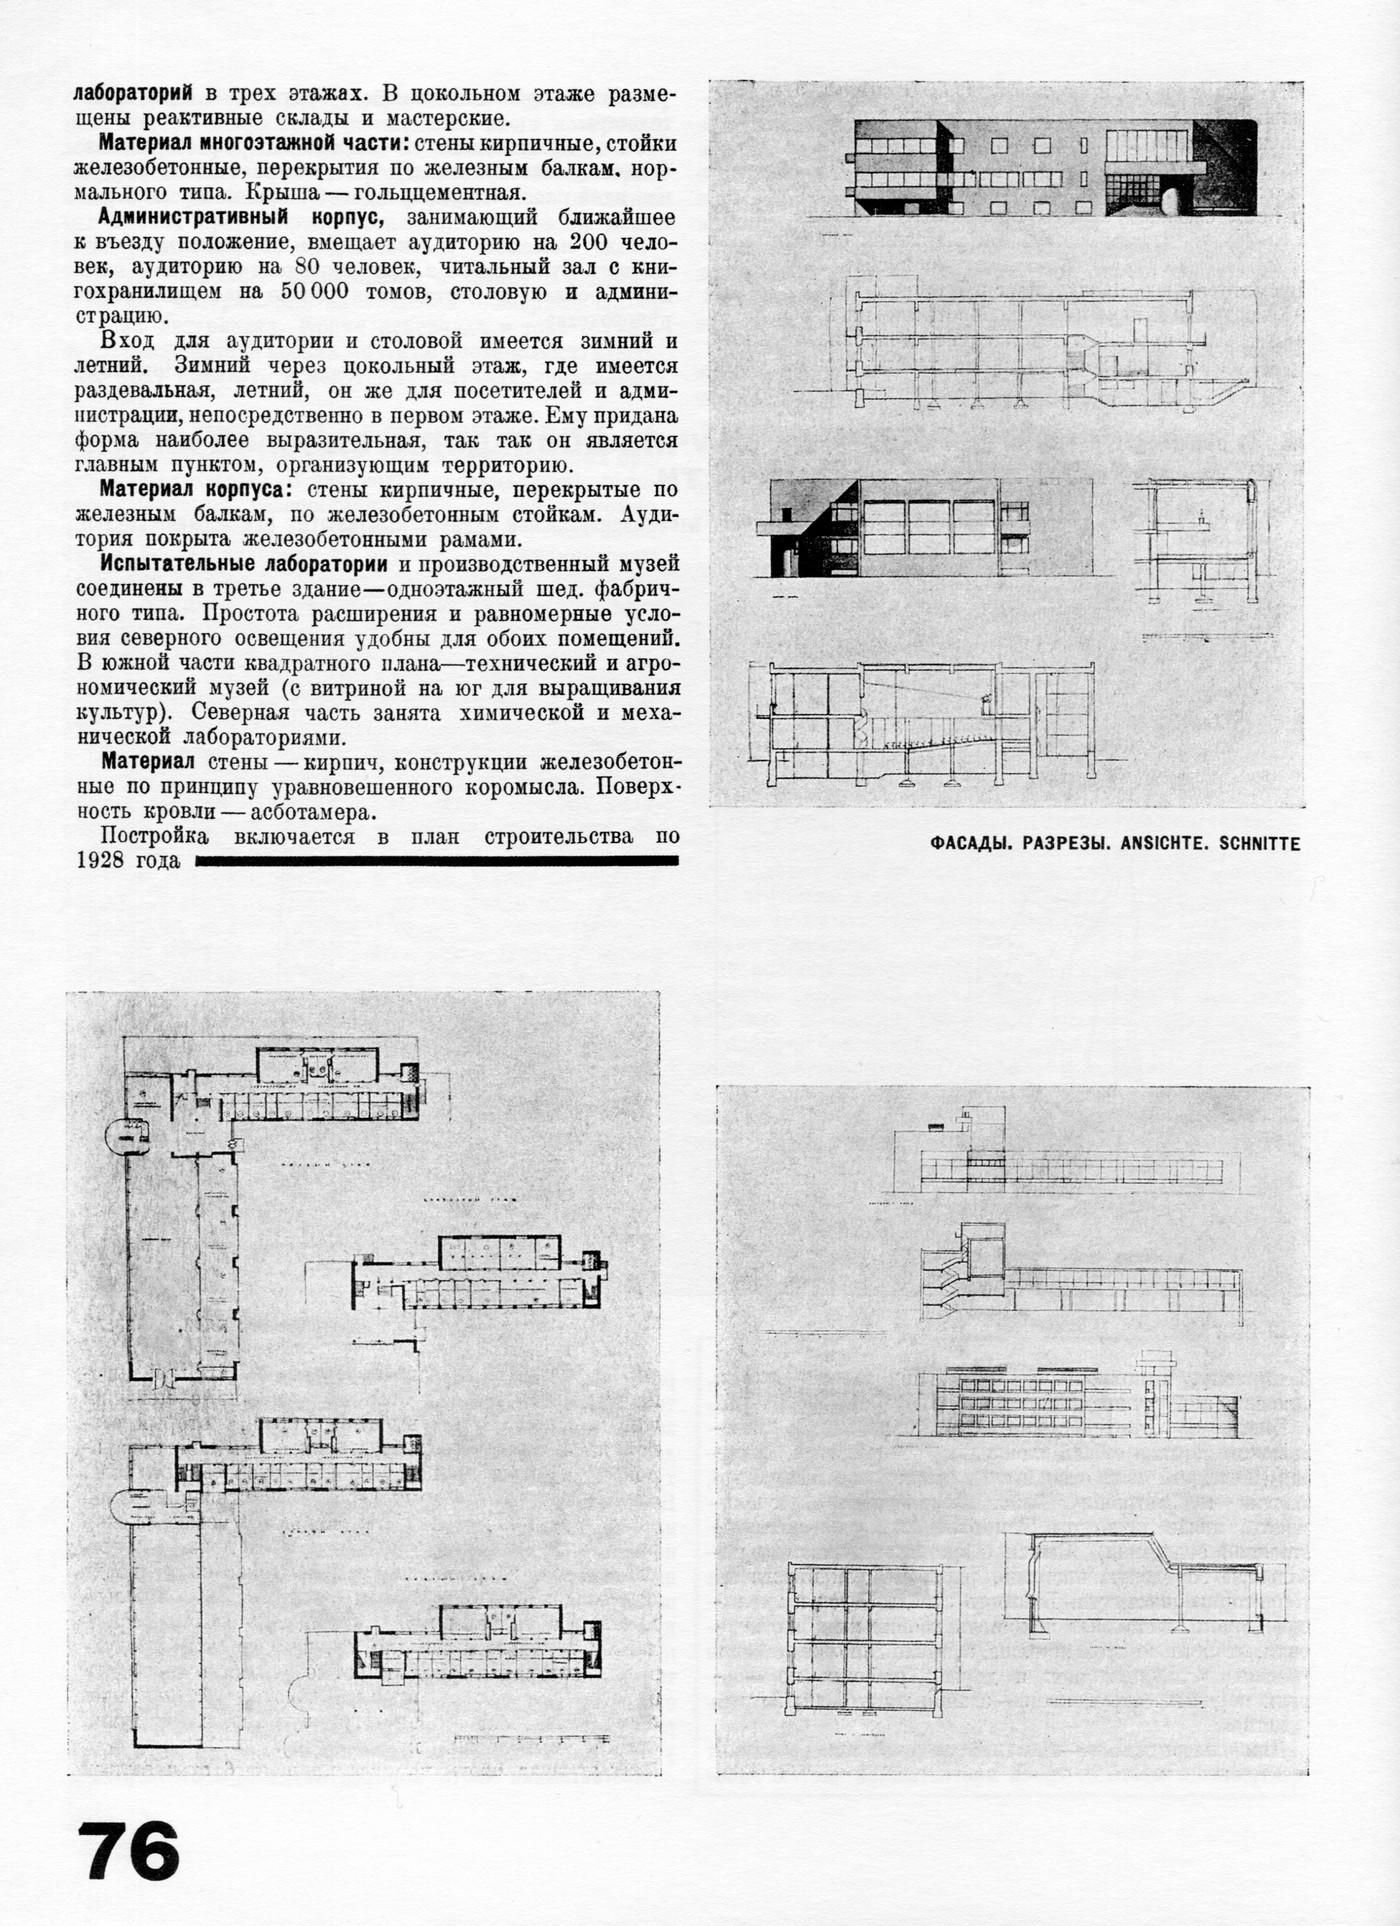 tehne.com-sa-1927-2-1400-032